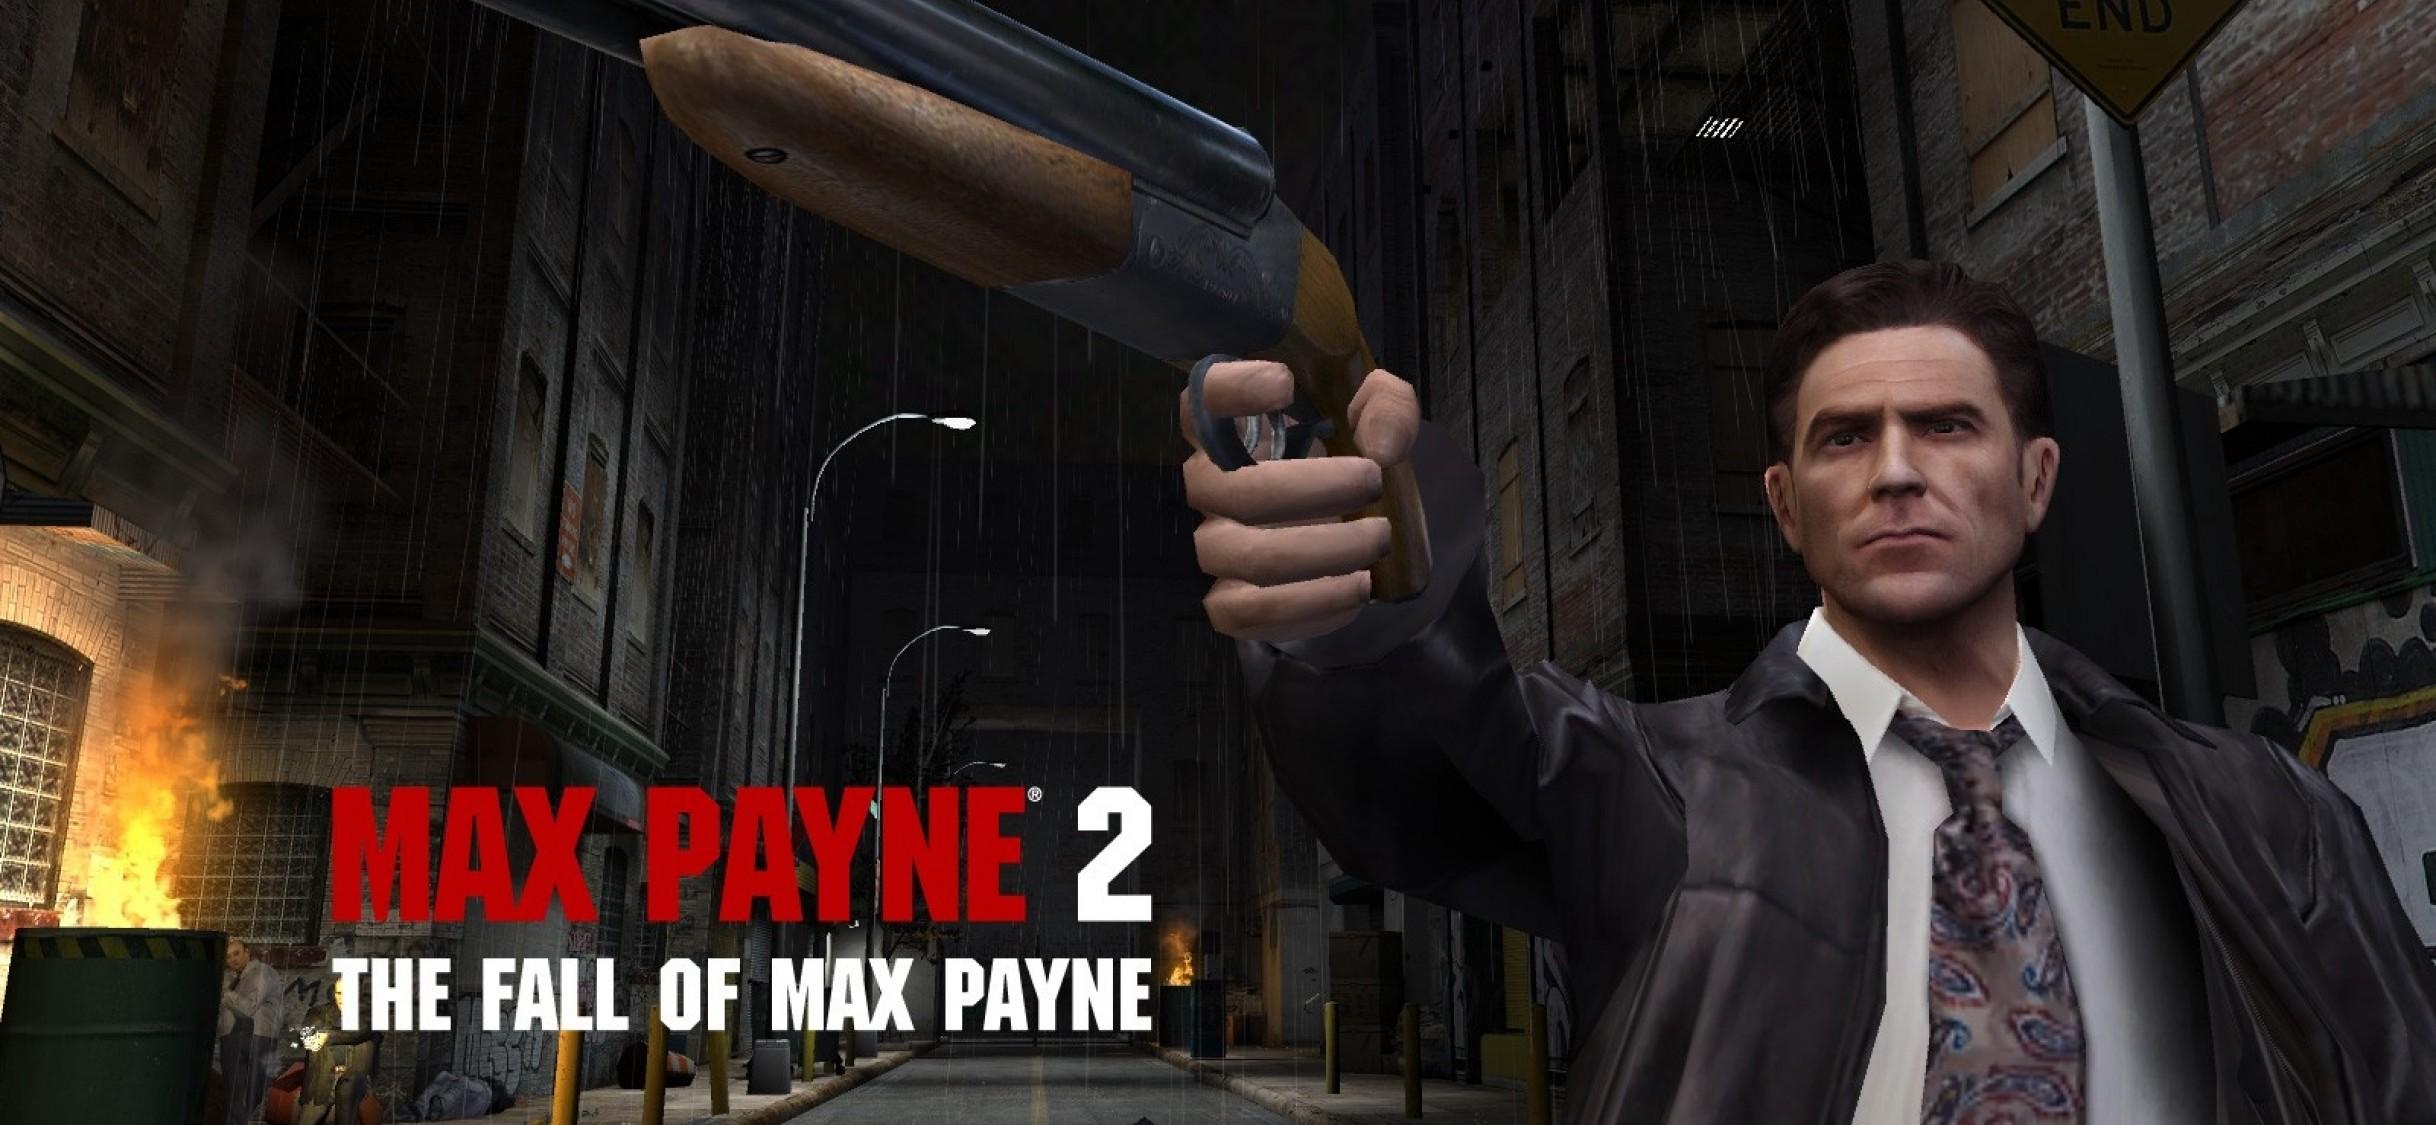 The Fall Of Max Payne Hd Wallpaper Iphone X Hd Wallpaper